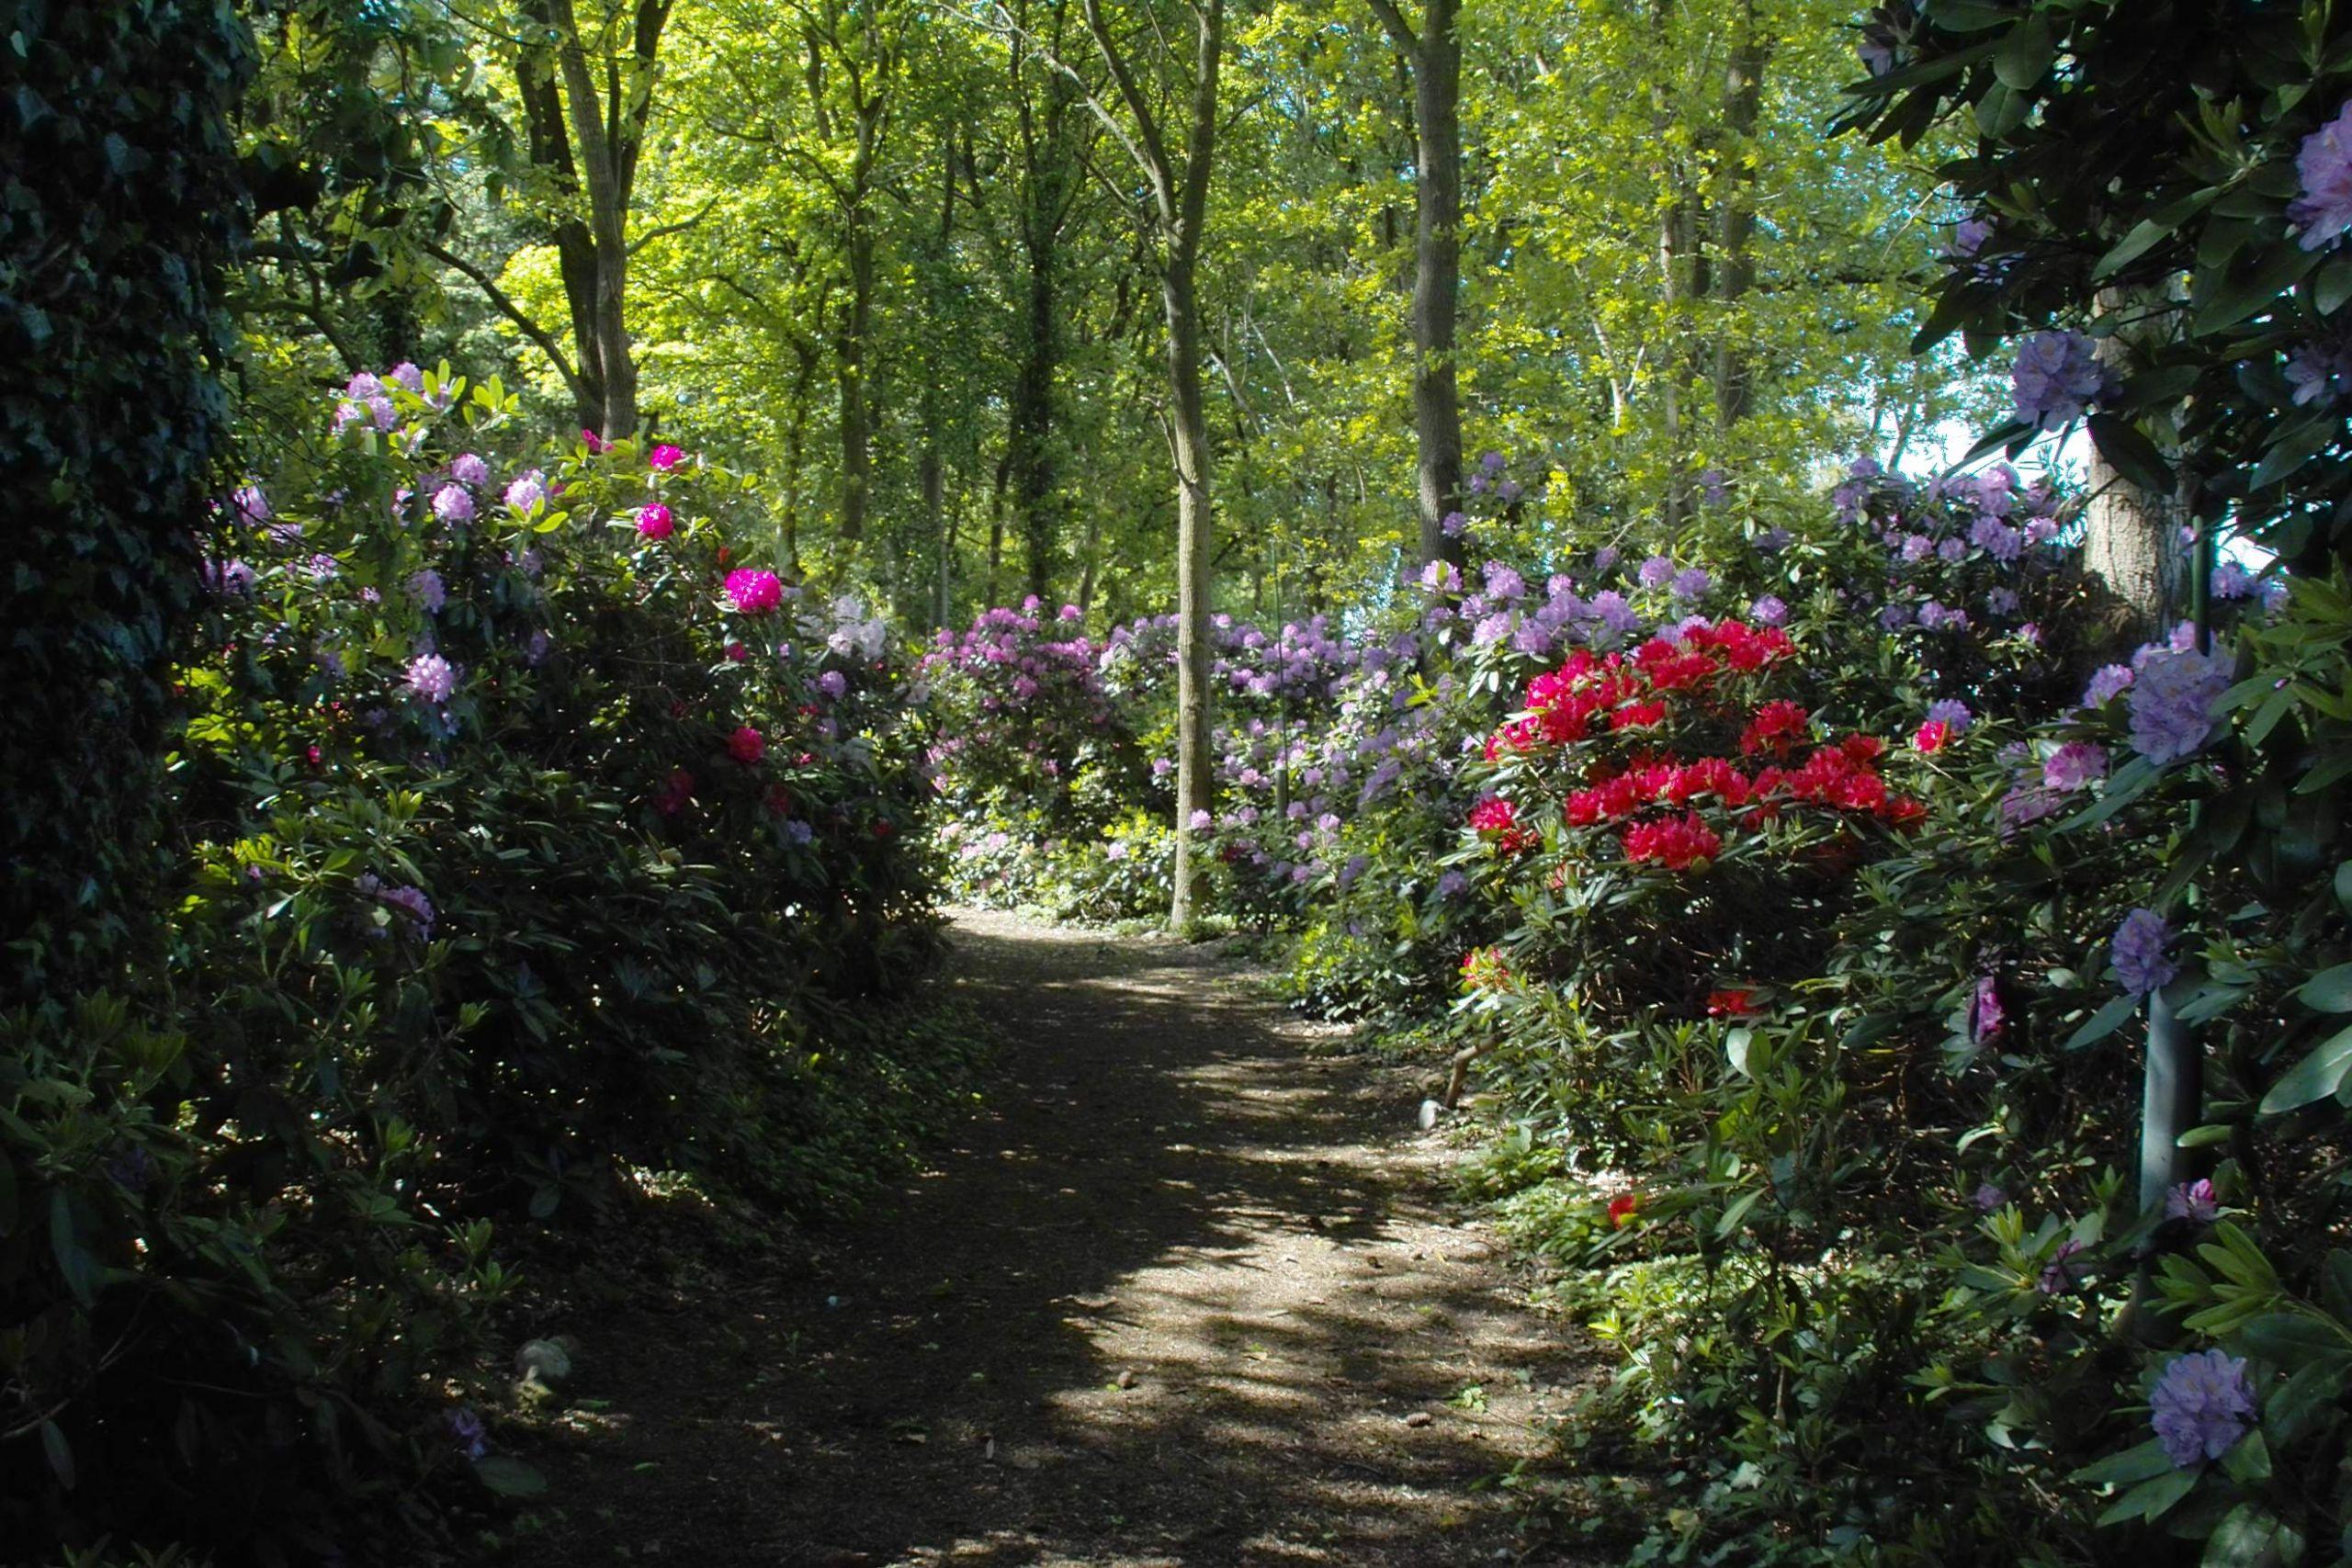 Garten König Wiefelstede Neu Mit Liebe Zum Detail Gartenträume In Wiefelstede